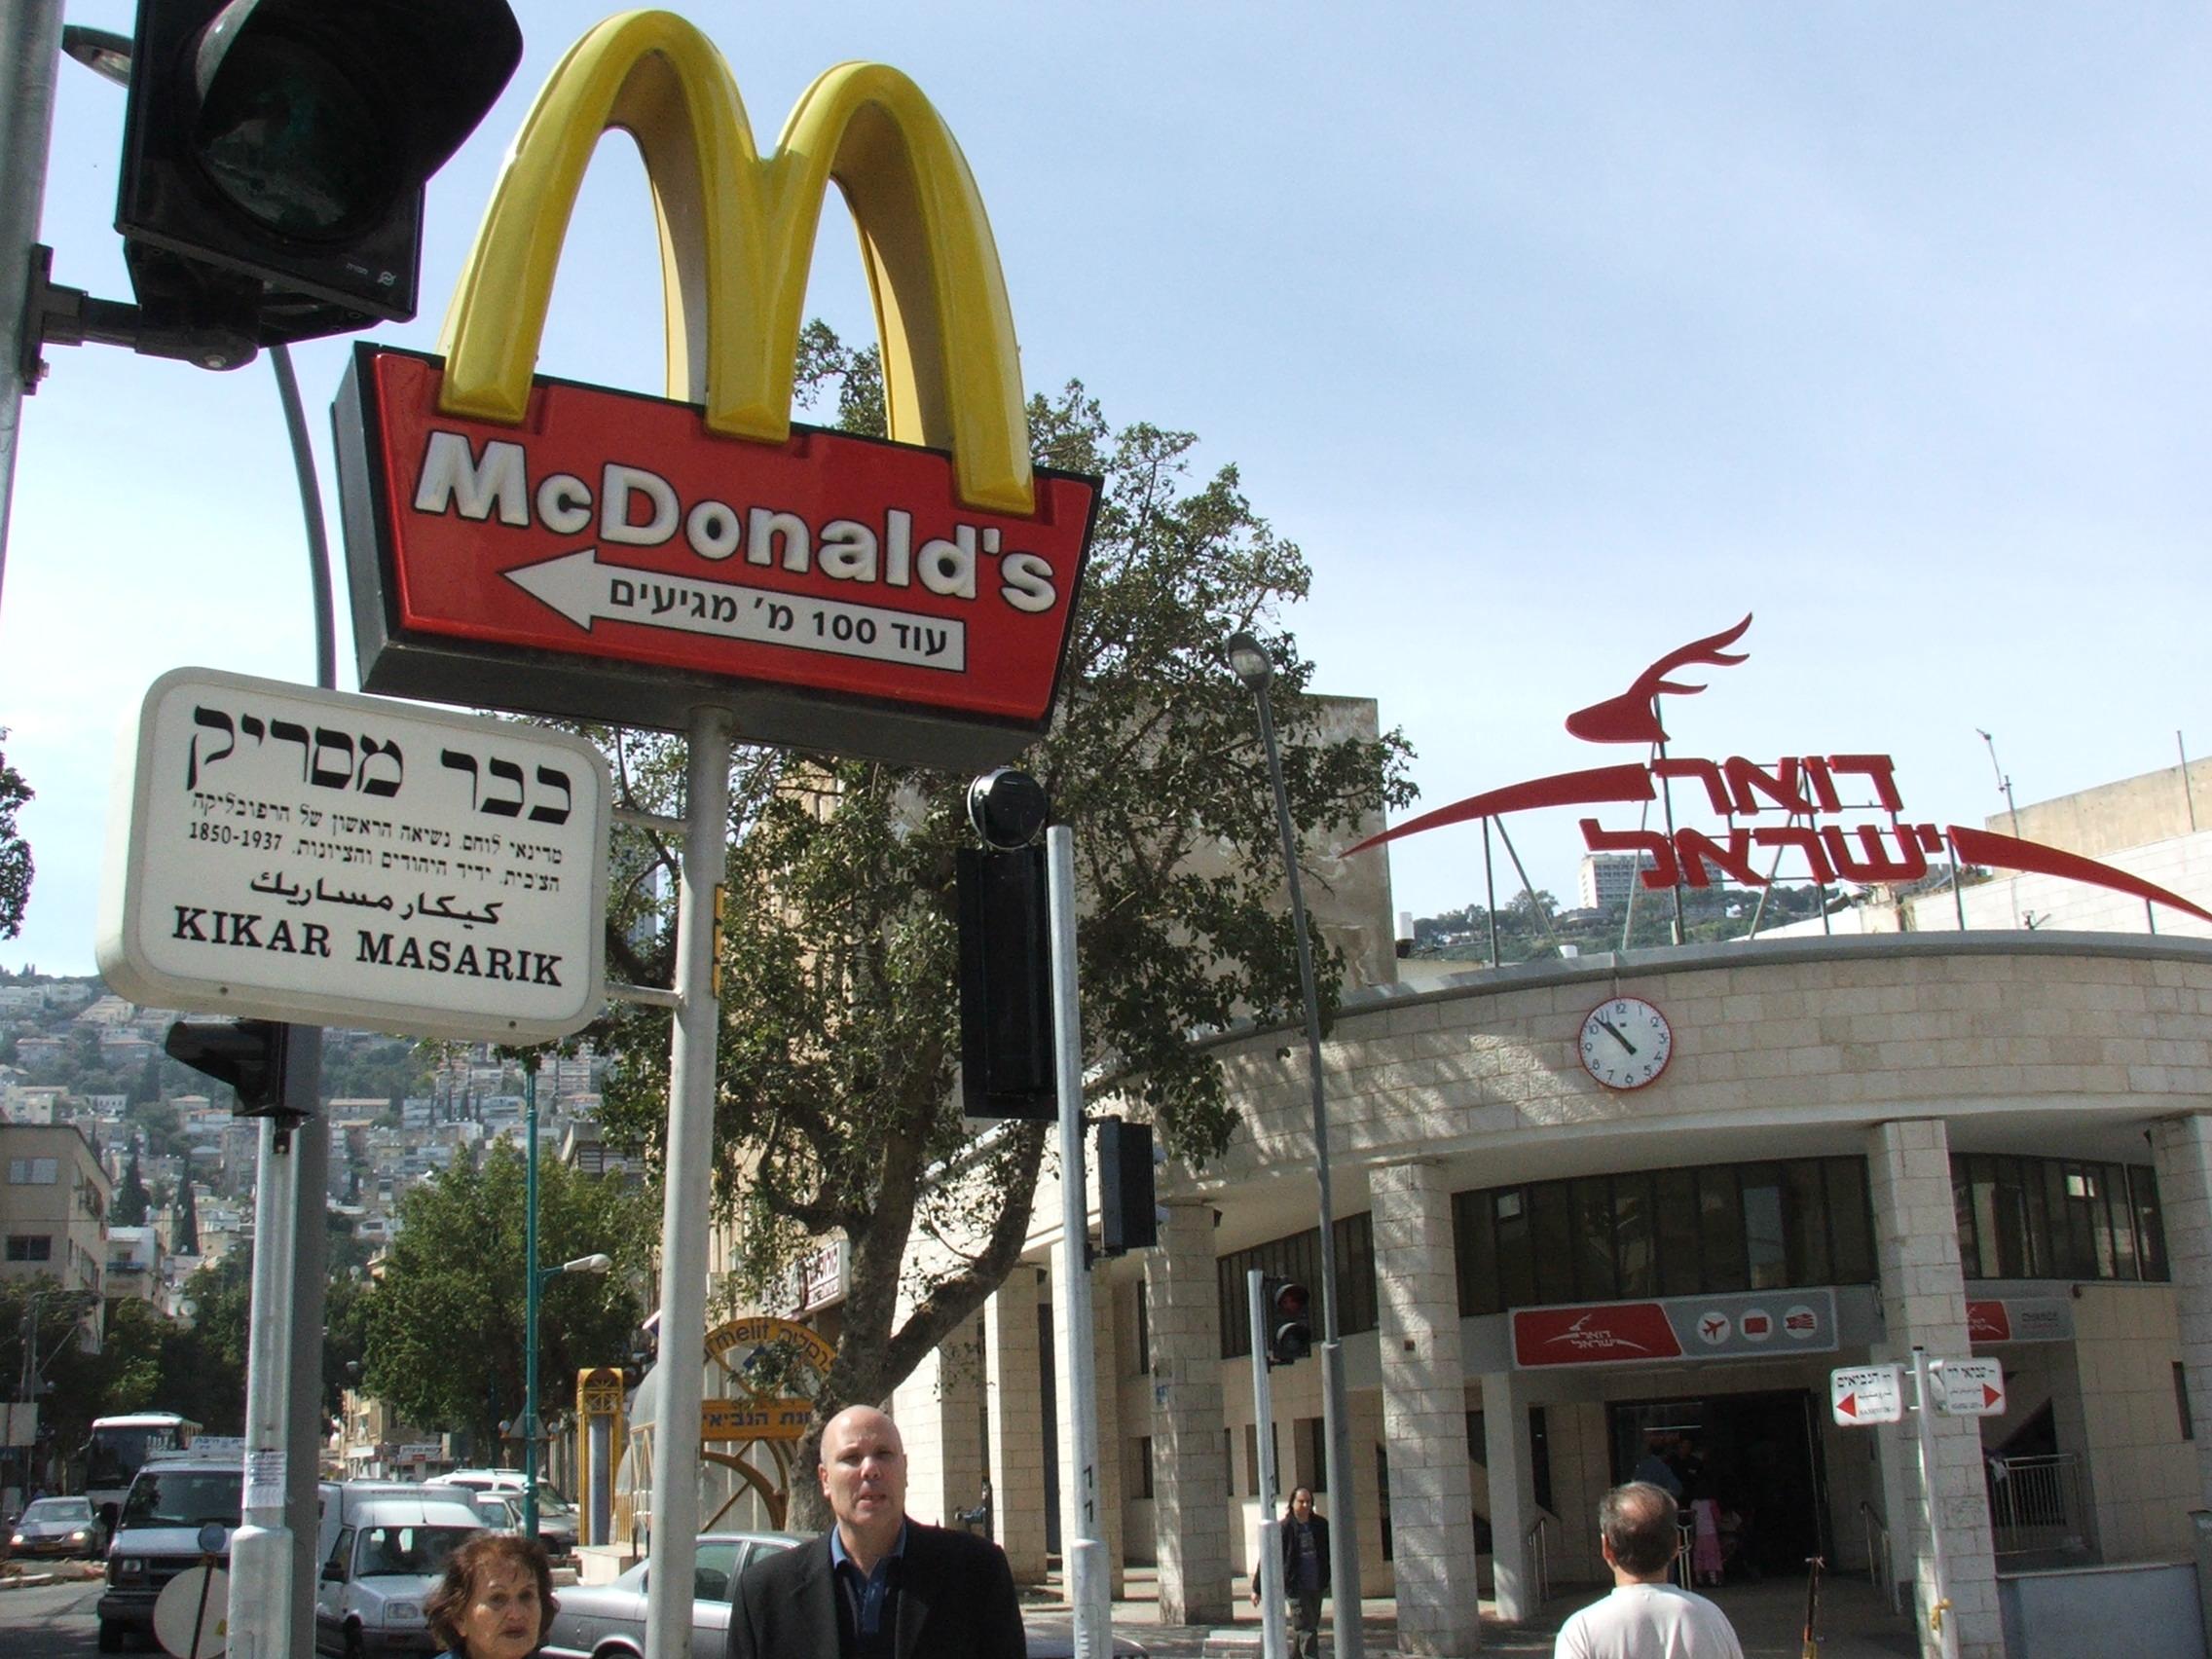 McDonald's in Haifa. Credit: Kenyh/Wikimedia Commons.